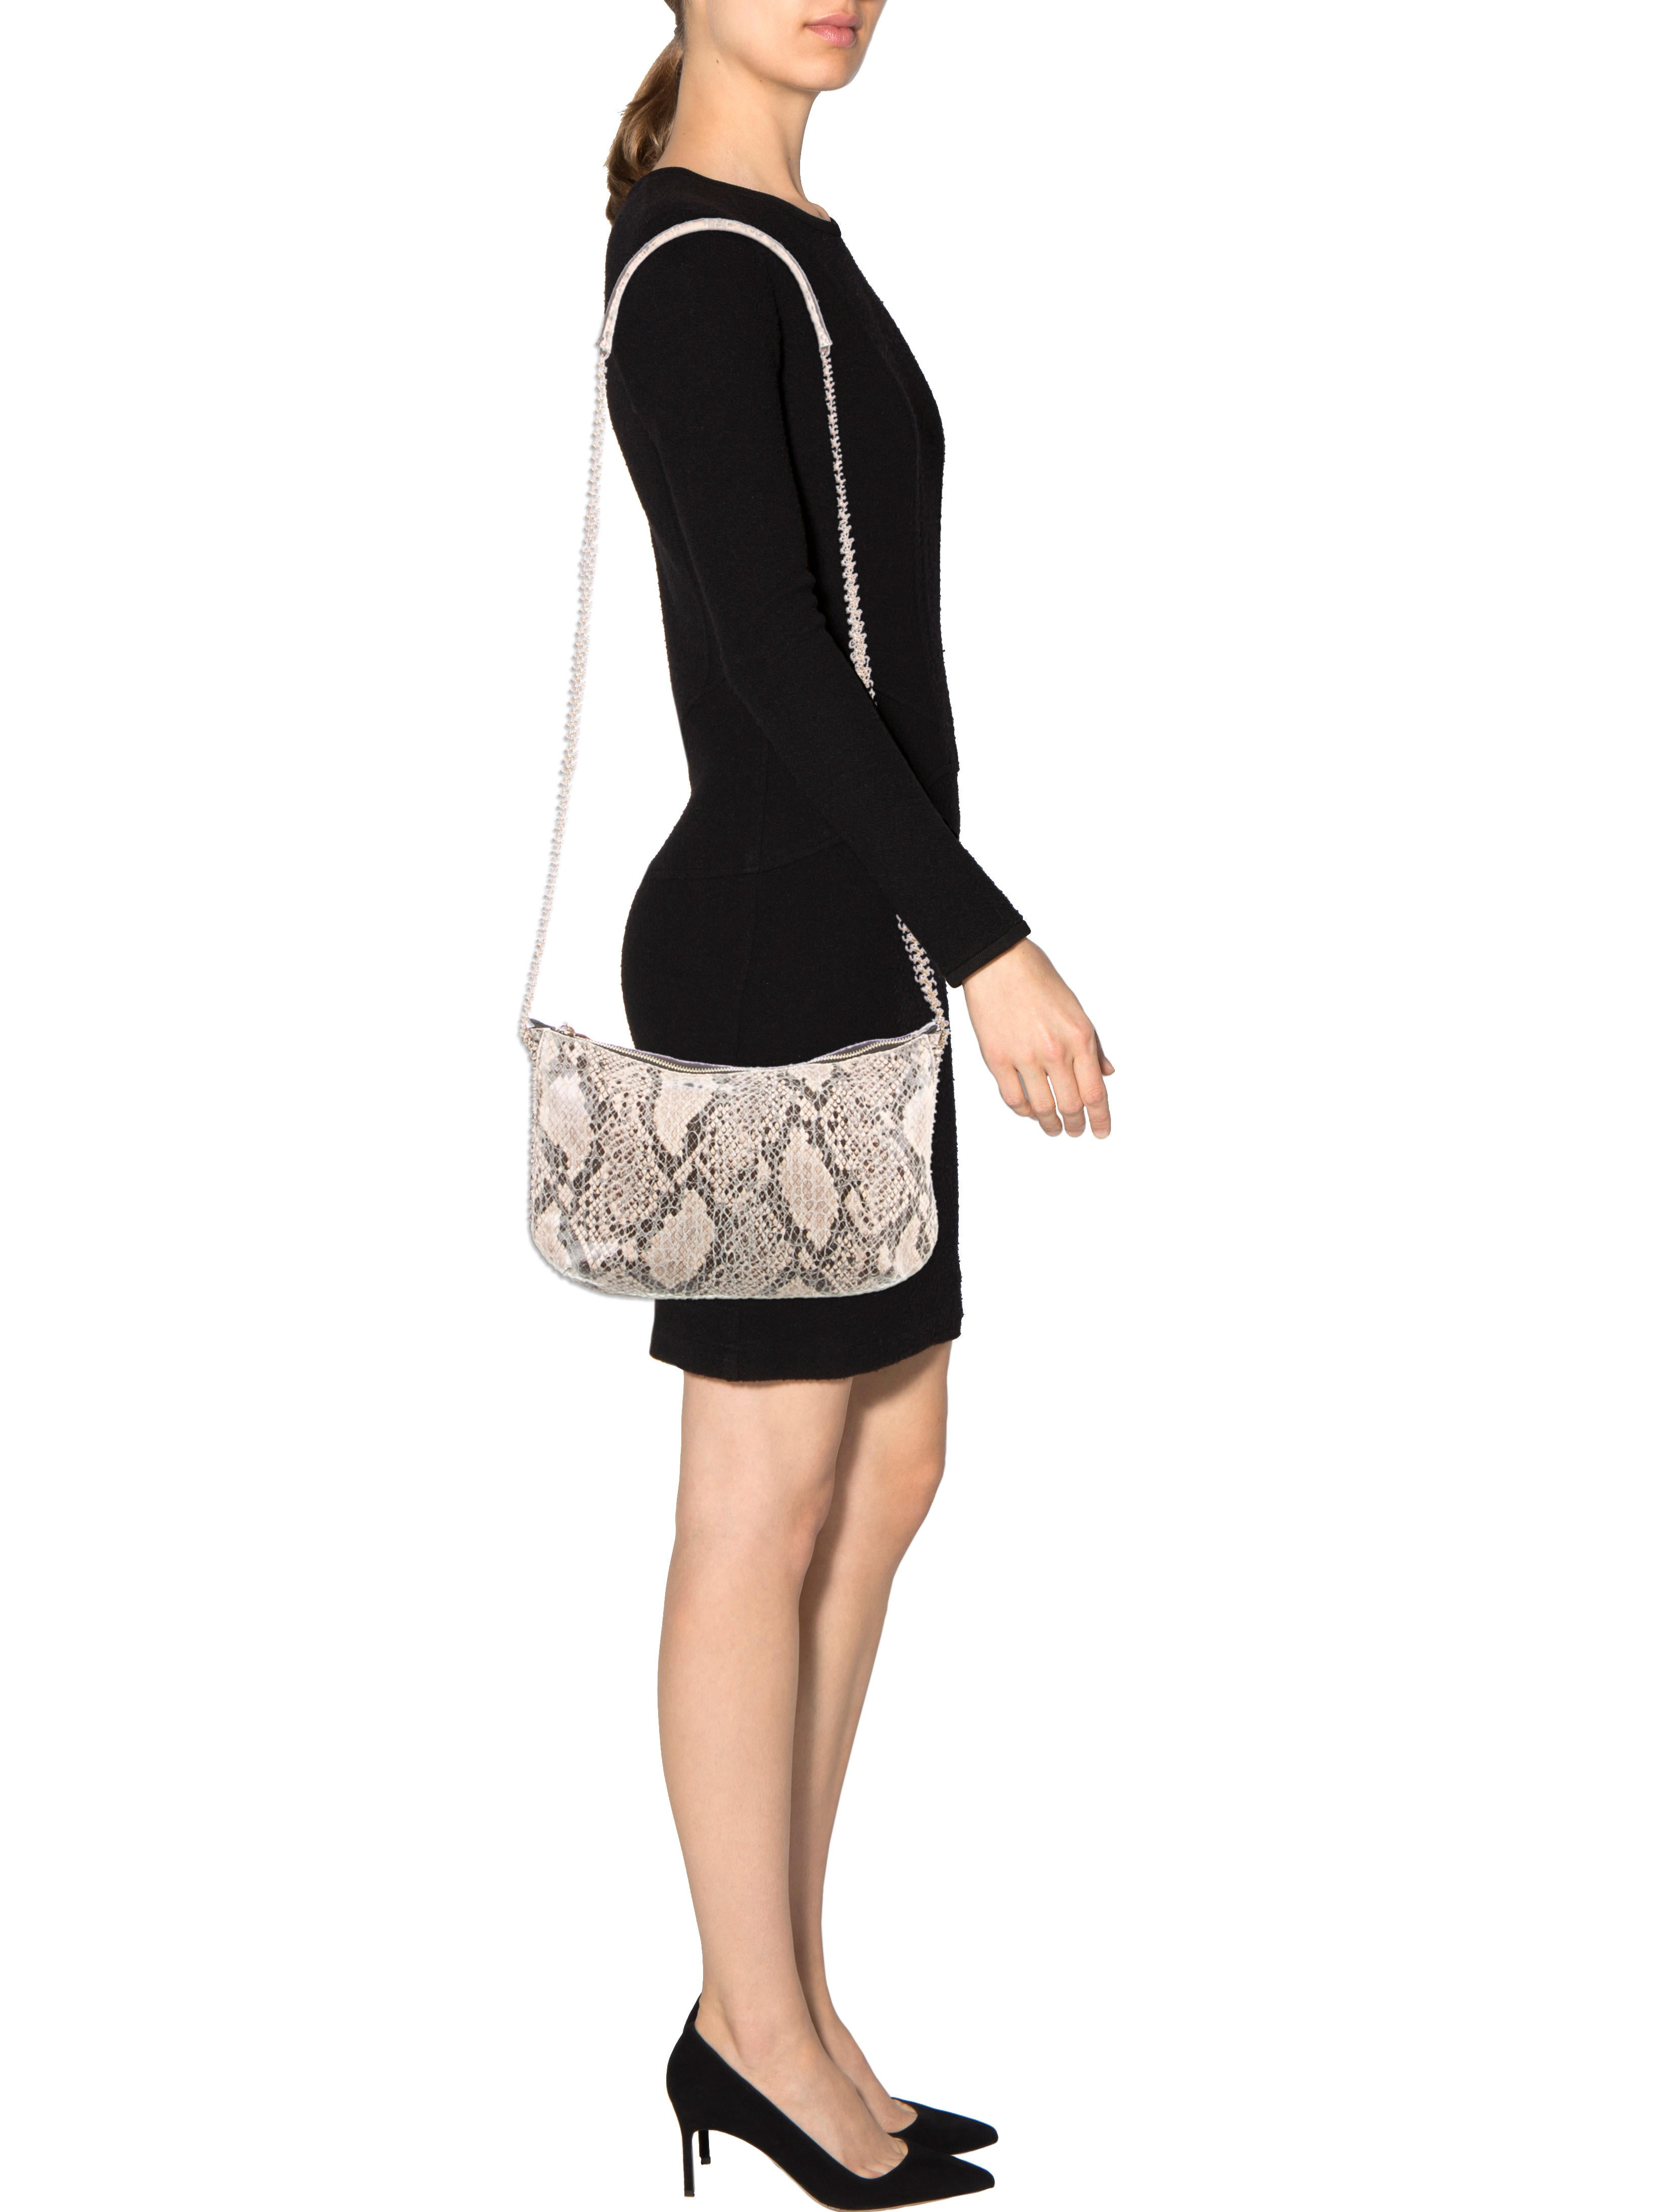 Baileyboo cocktail dress